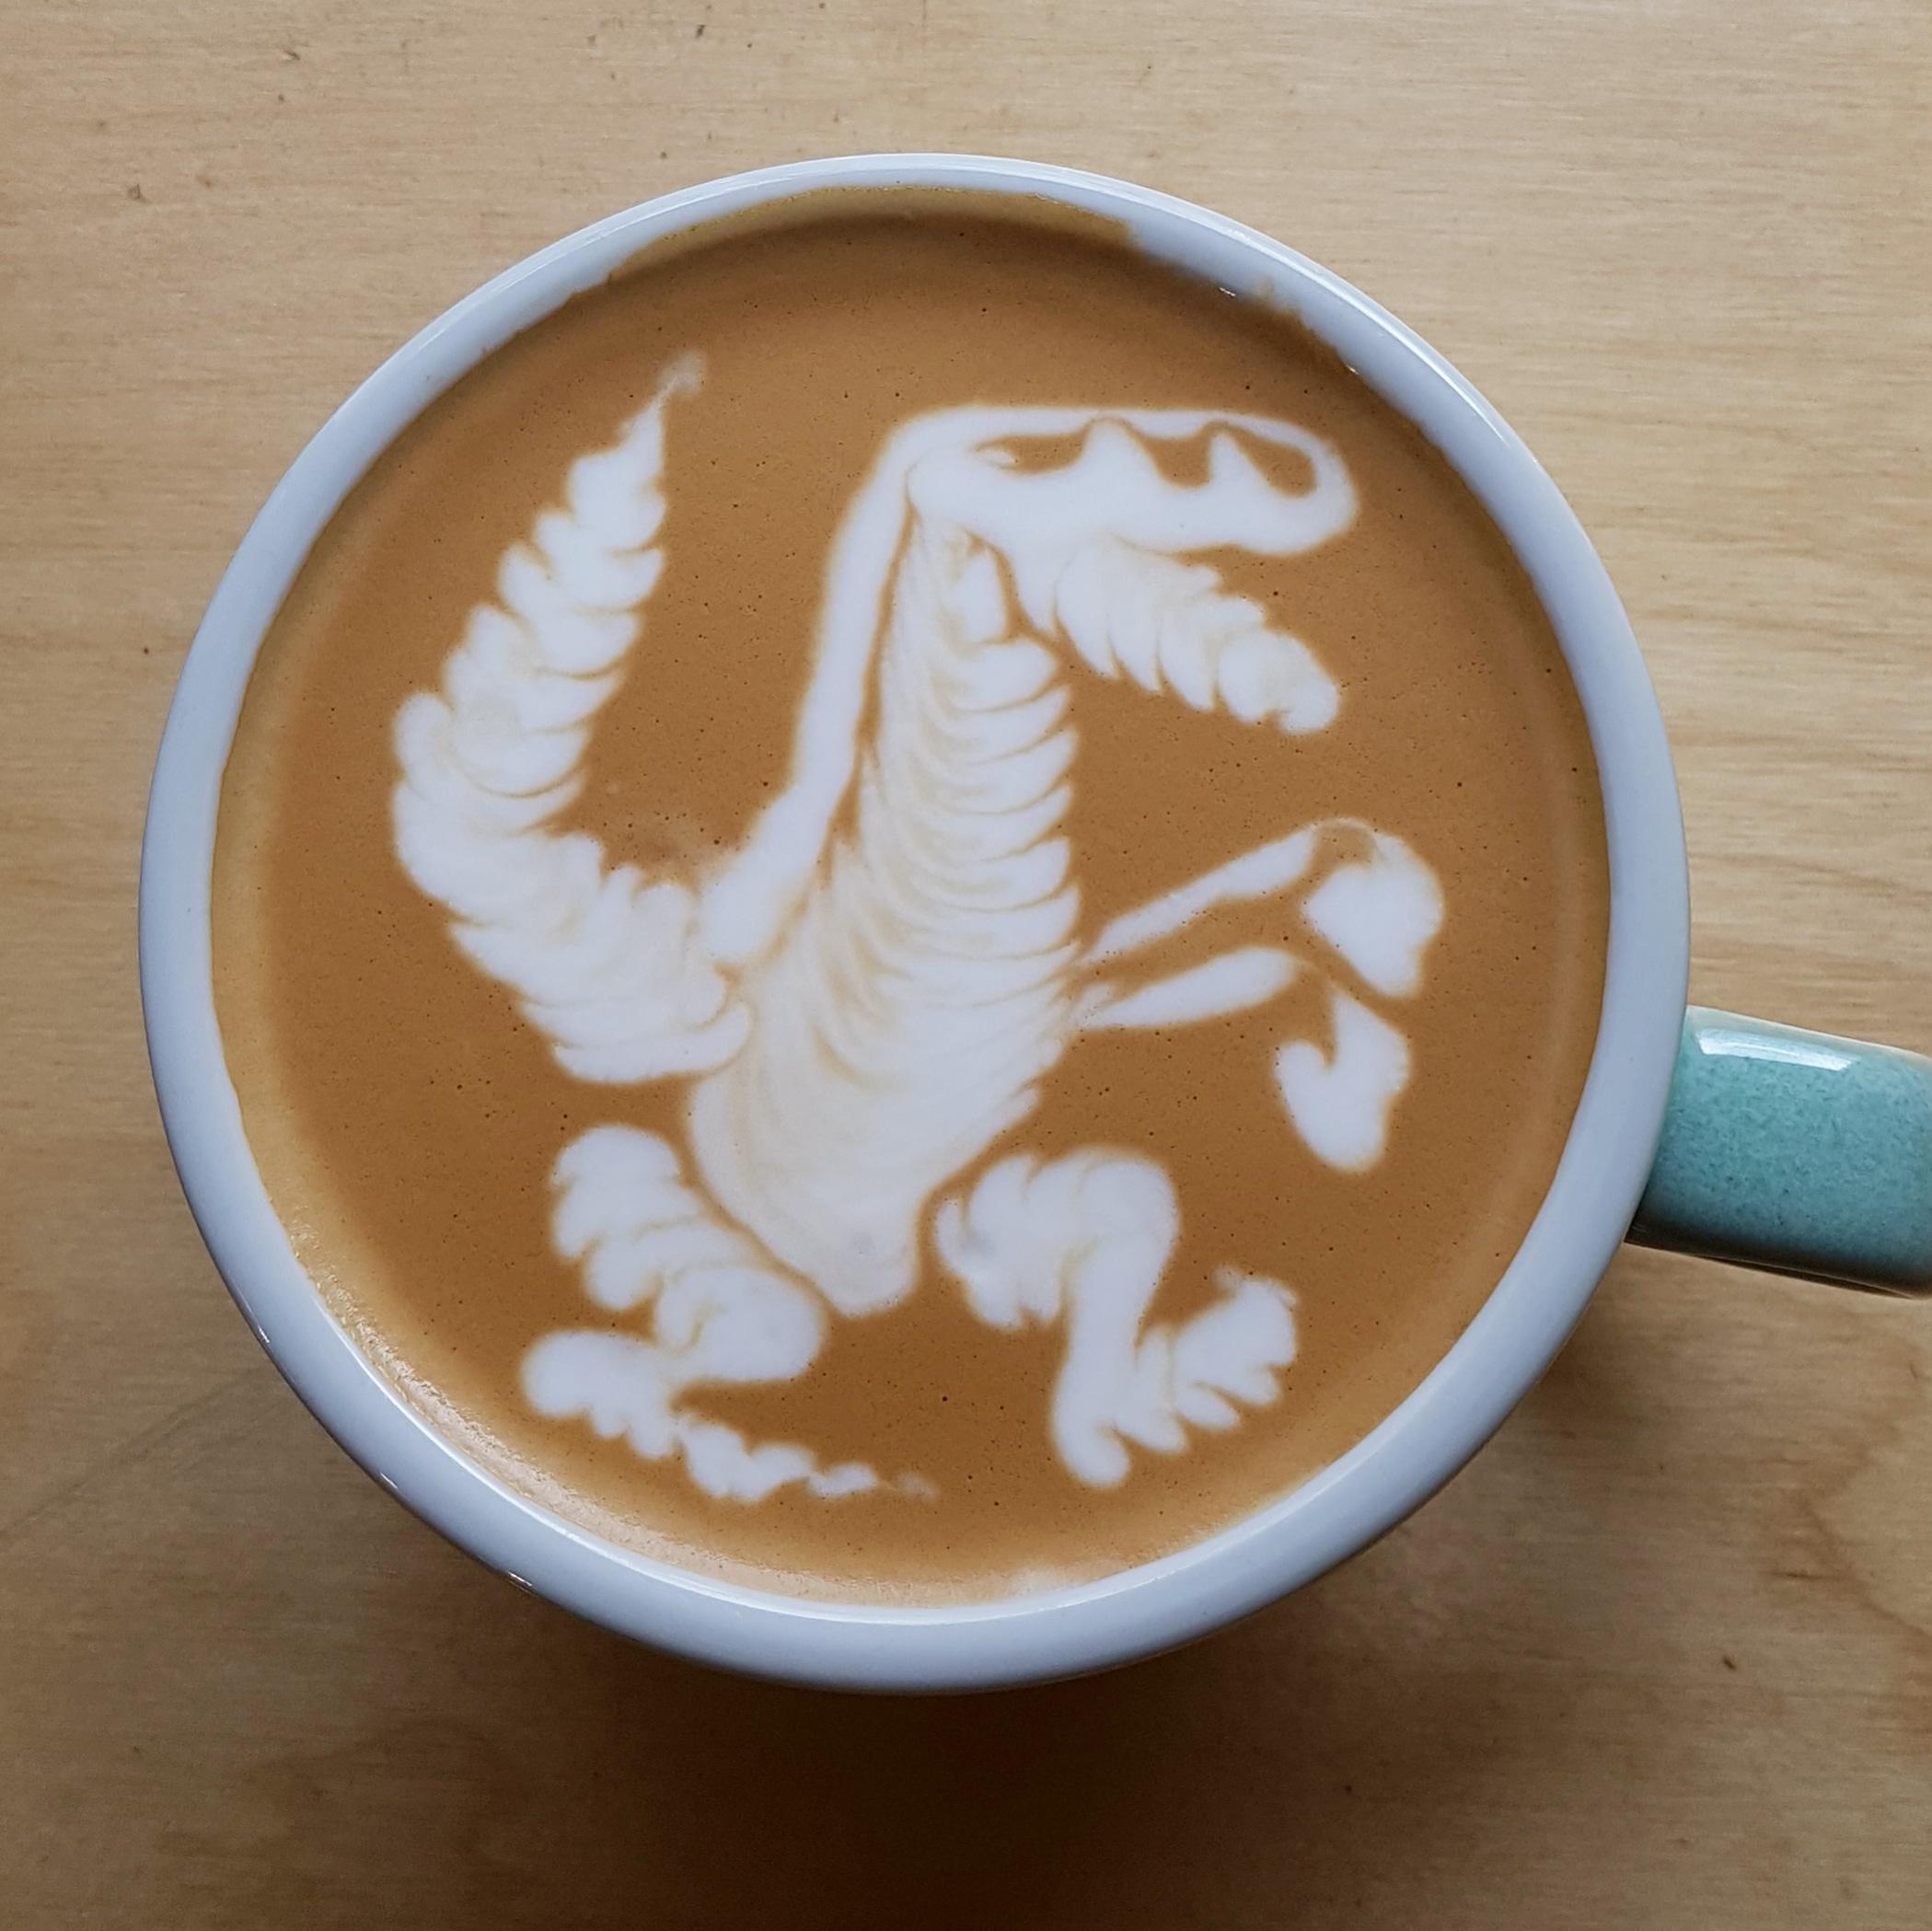 Город: Москва<br/>Заведение: Crosby Coffee Co<br/>ставка: 200 руб/ч